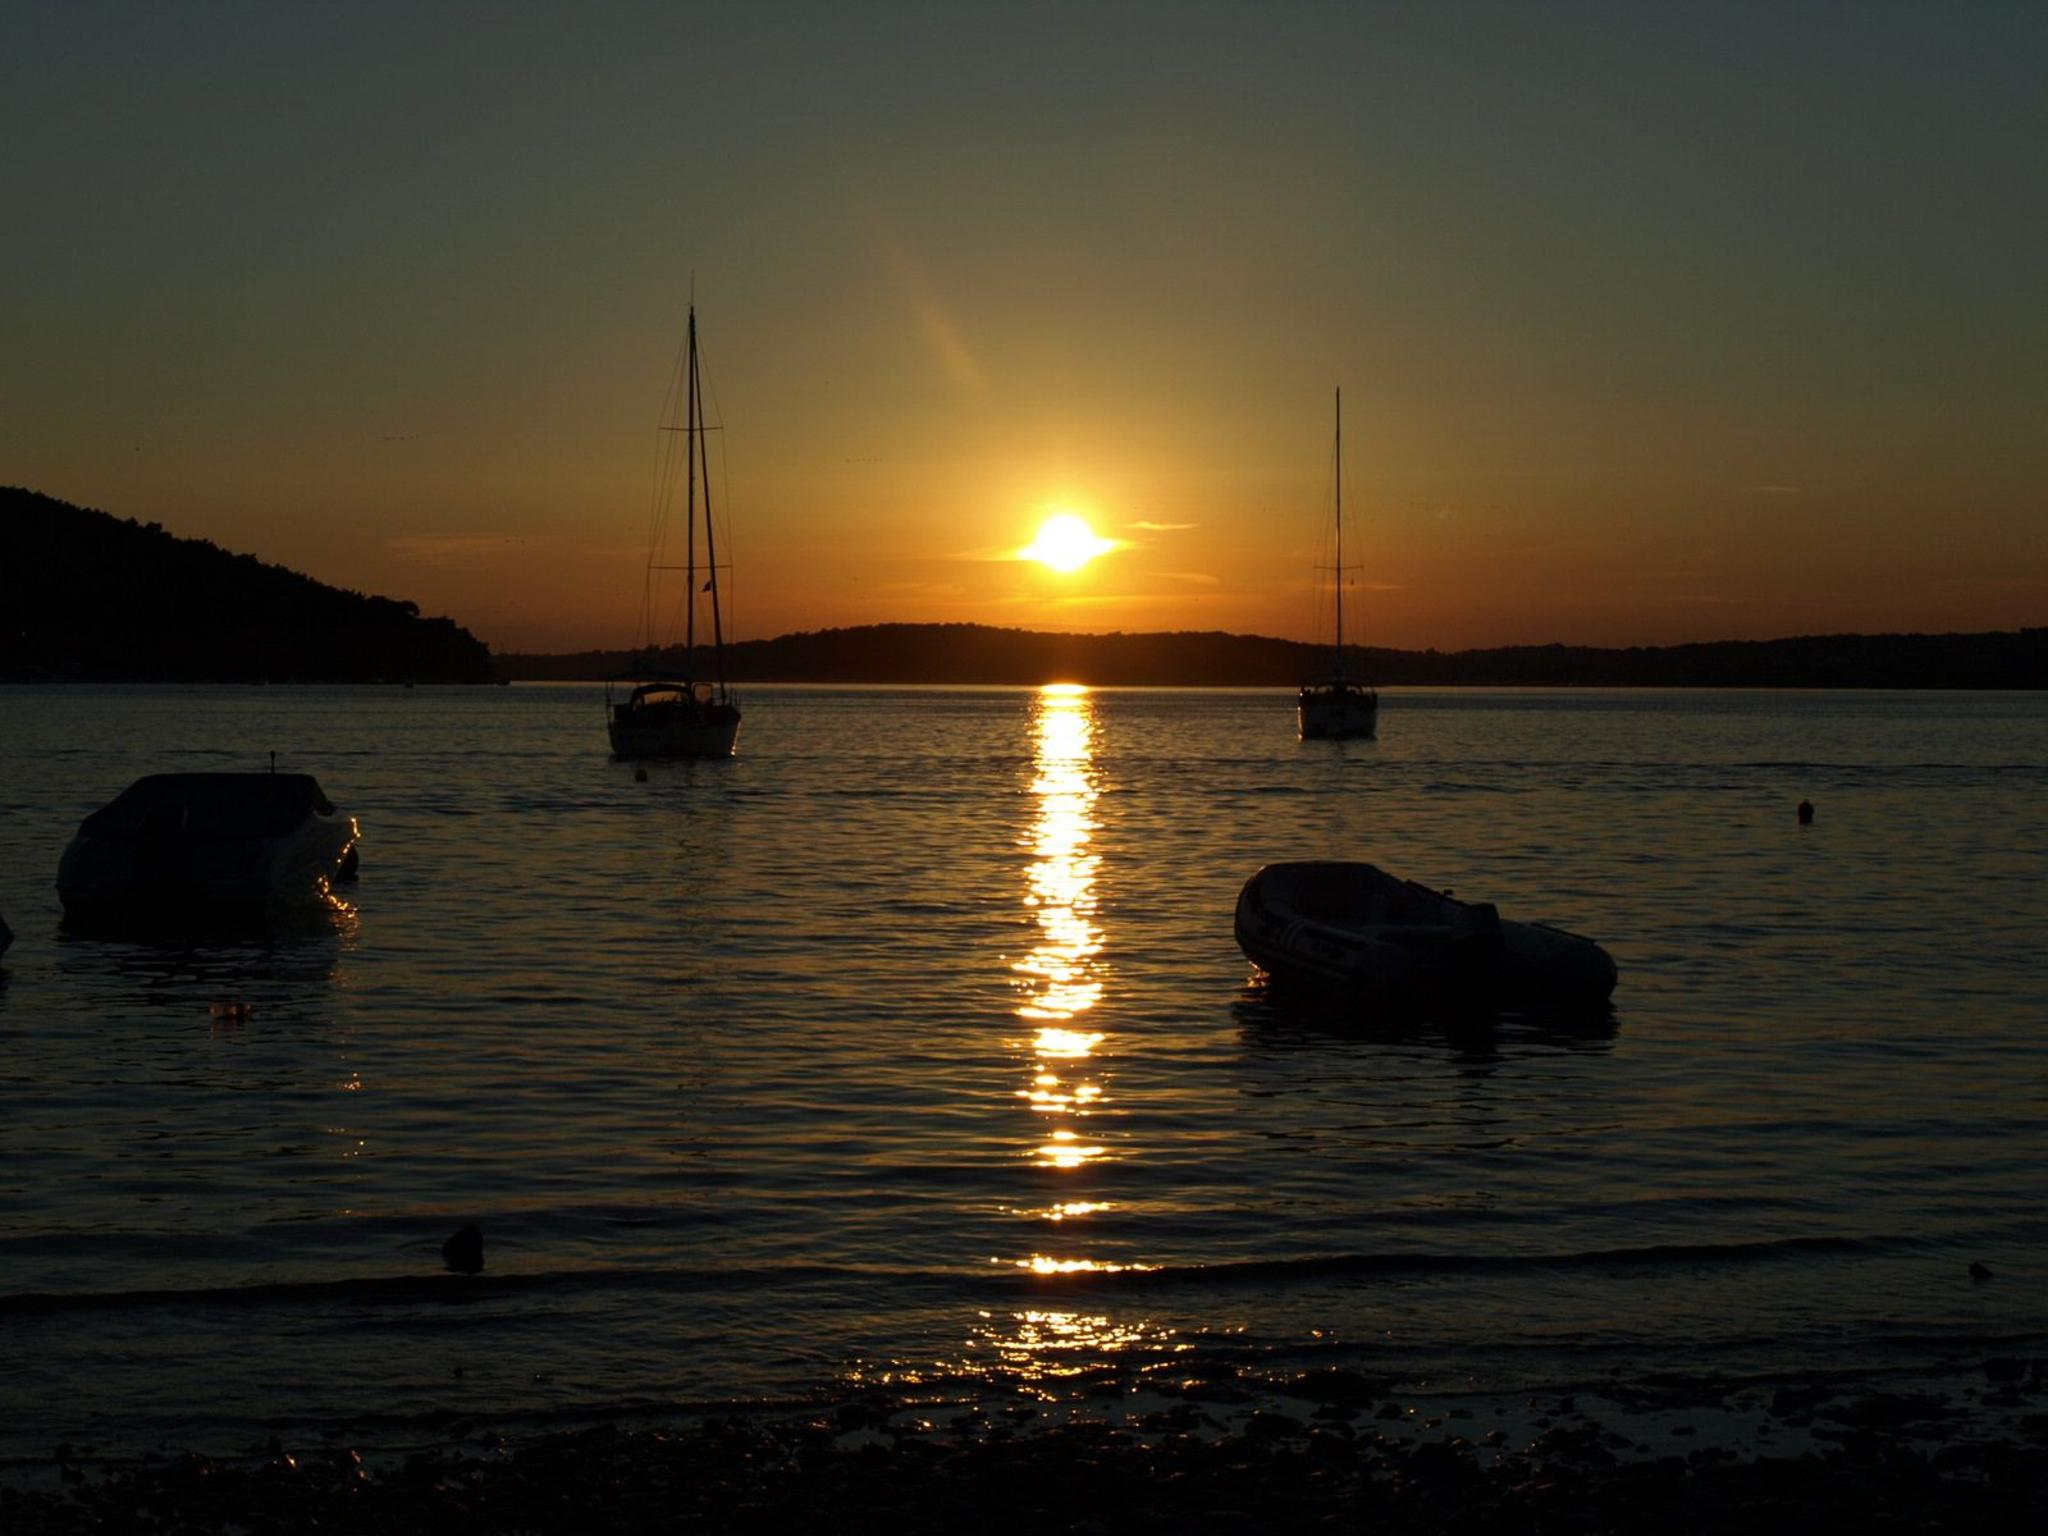 Sunset at holiday by sixtieman